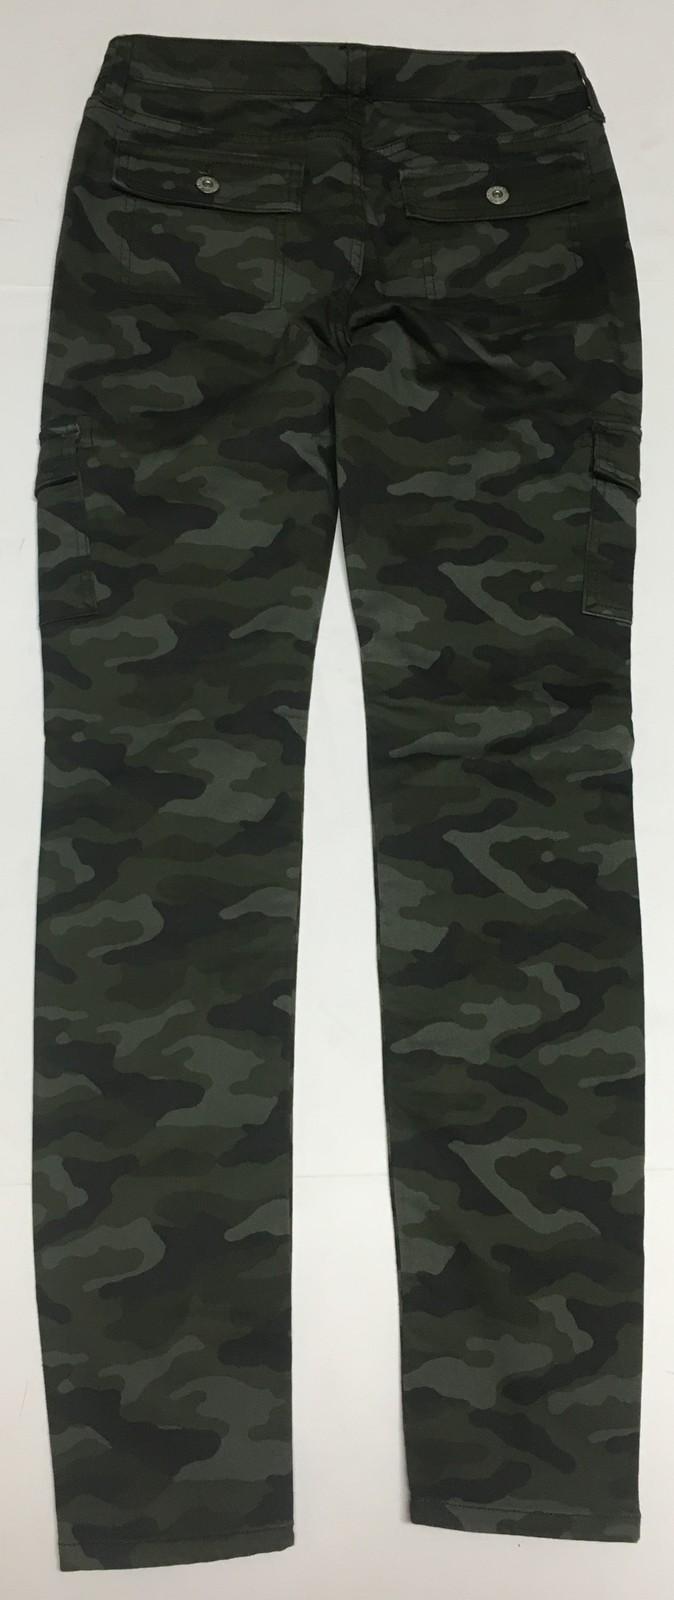 Arizona Camouflage Super Skinny Soft Stretch Pants Sz 5 image 6